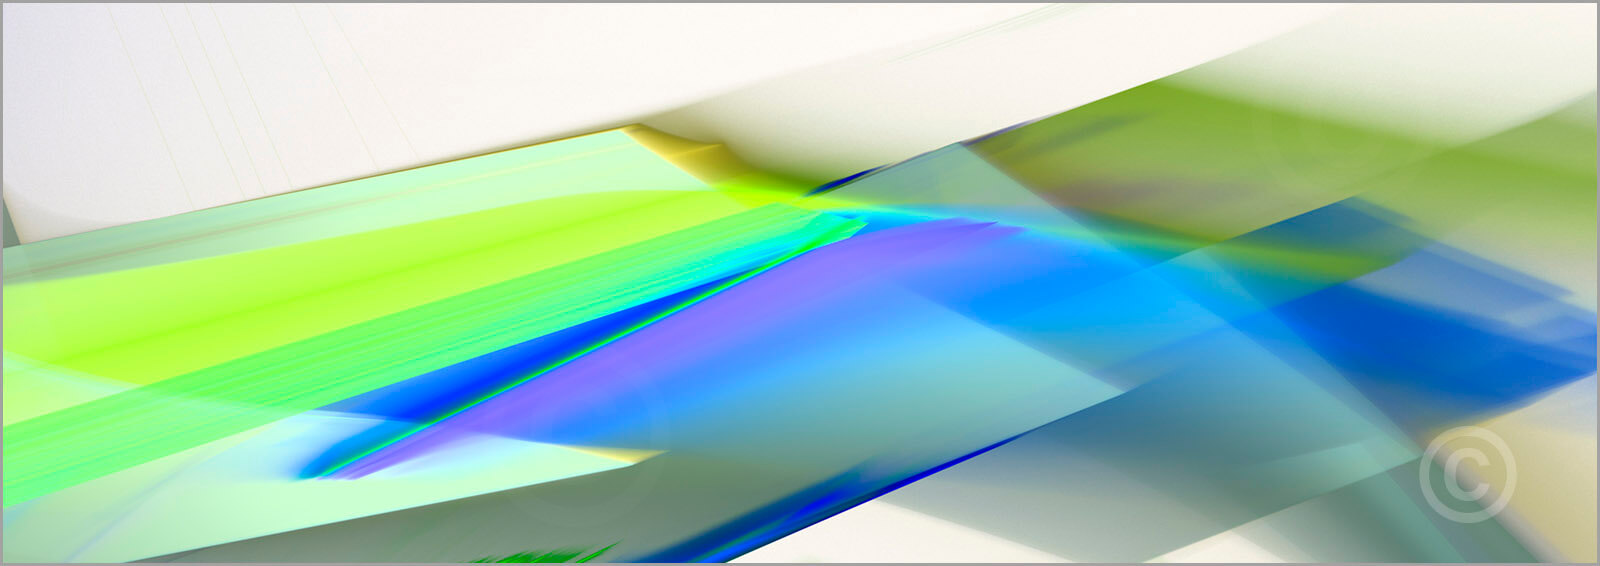 Colorshapes_F2_9856_XL